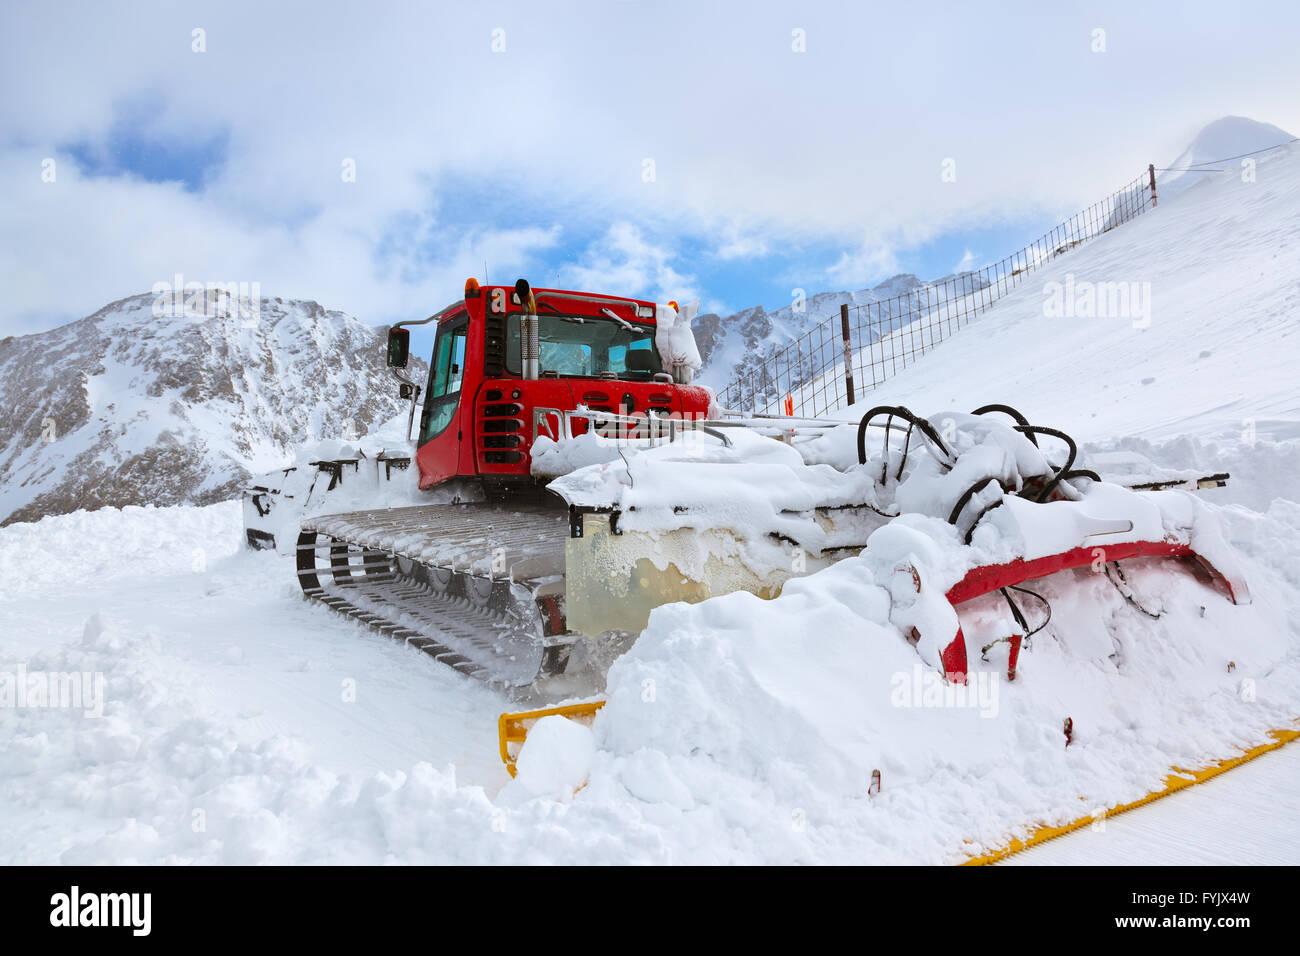 Machine for skiing slope preparations at Kaprun Austria - Stock Image